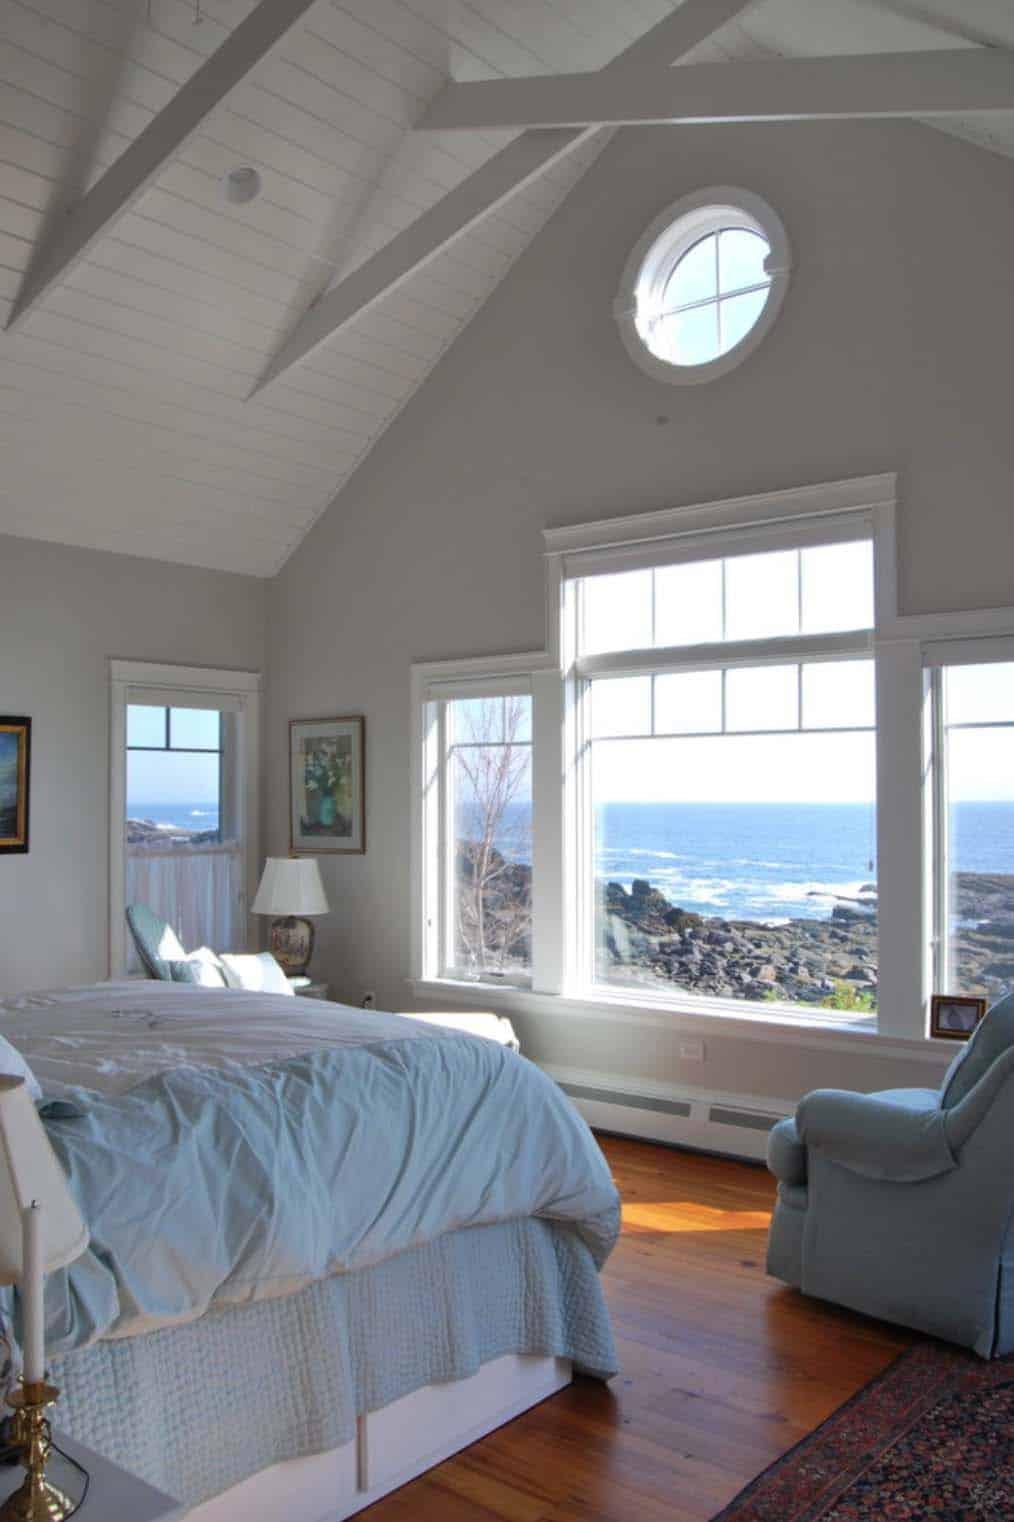 Elegant Seaside Cottage-Whipple Callender Architects-08-1 Kindesign